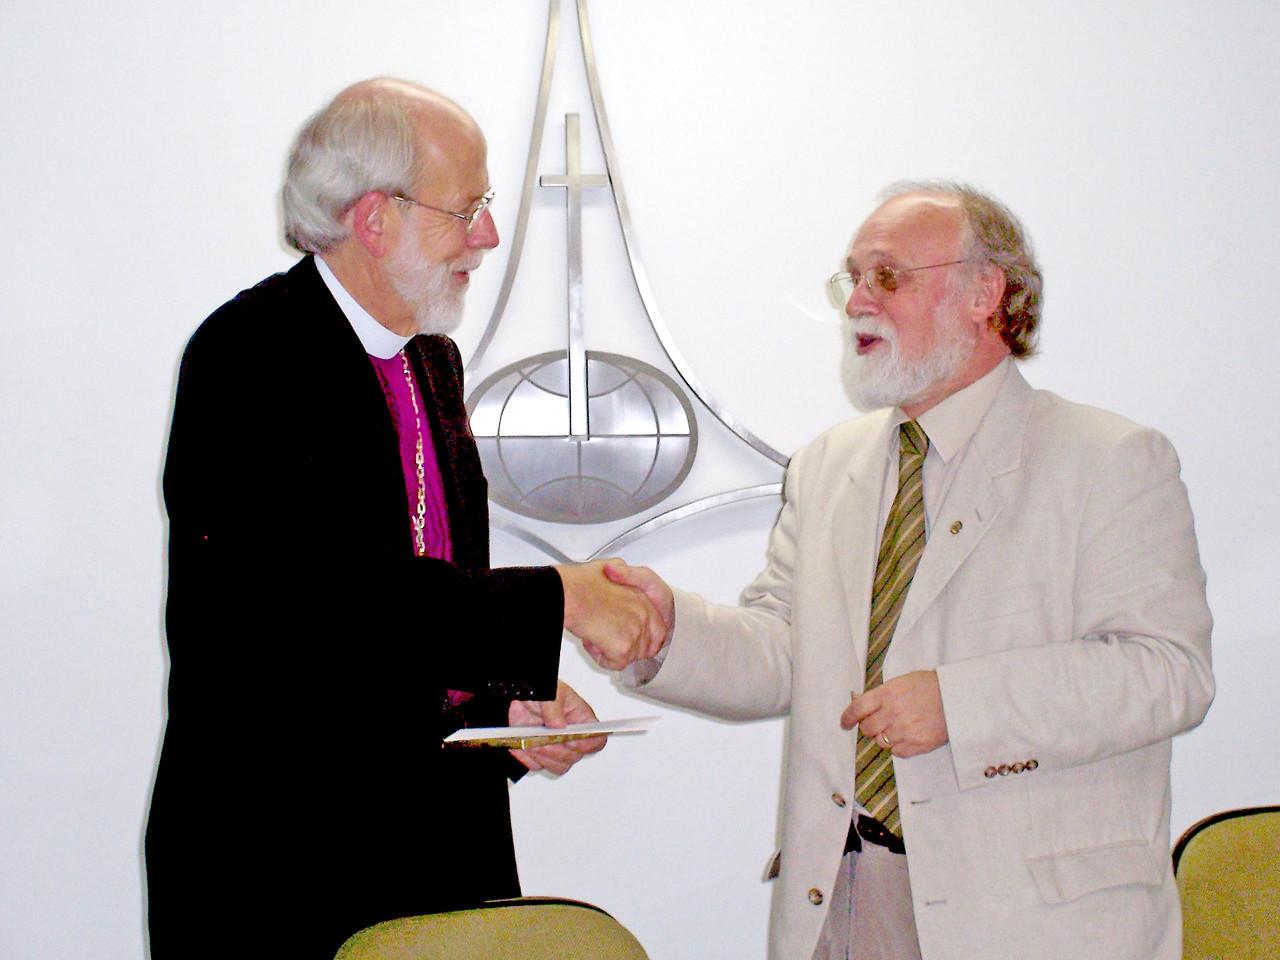 The Rev. Mark S. Hanson (left), LWF president and ELCA presiding bishop, and met Oct. 12 with the Rev. Walter Altmann, pastor president, Igreja Evangélica de Confissão Luterana no Brasil (Evangelical Church of the Lutheran Confession in Brazil), Sao Paulo, Brazil.